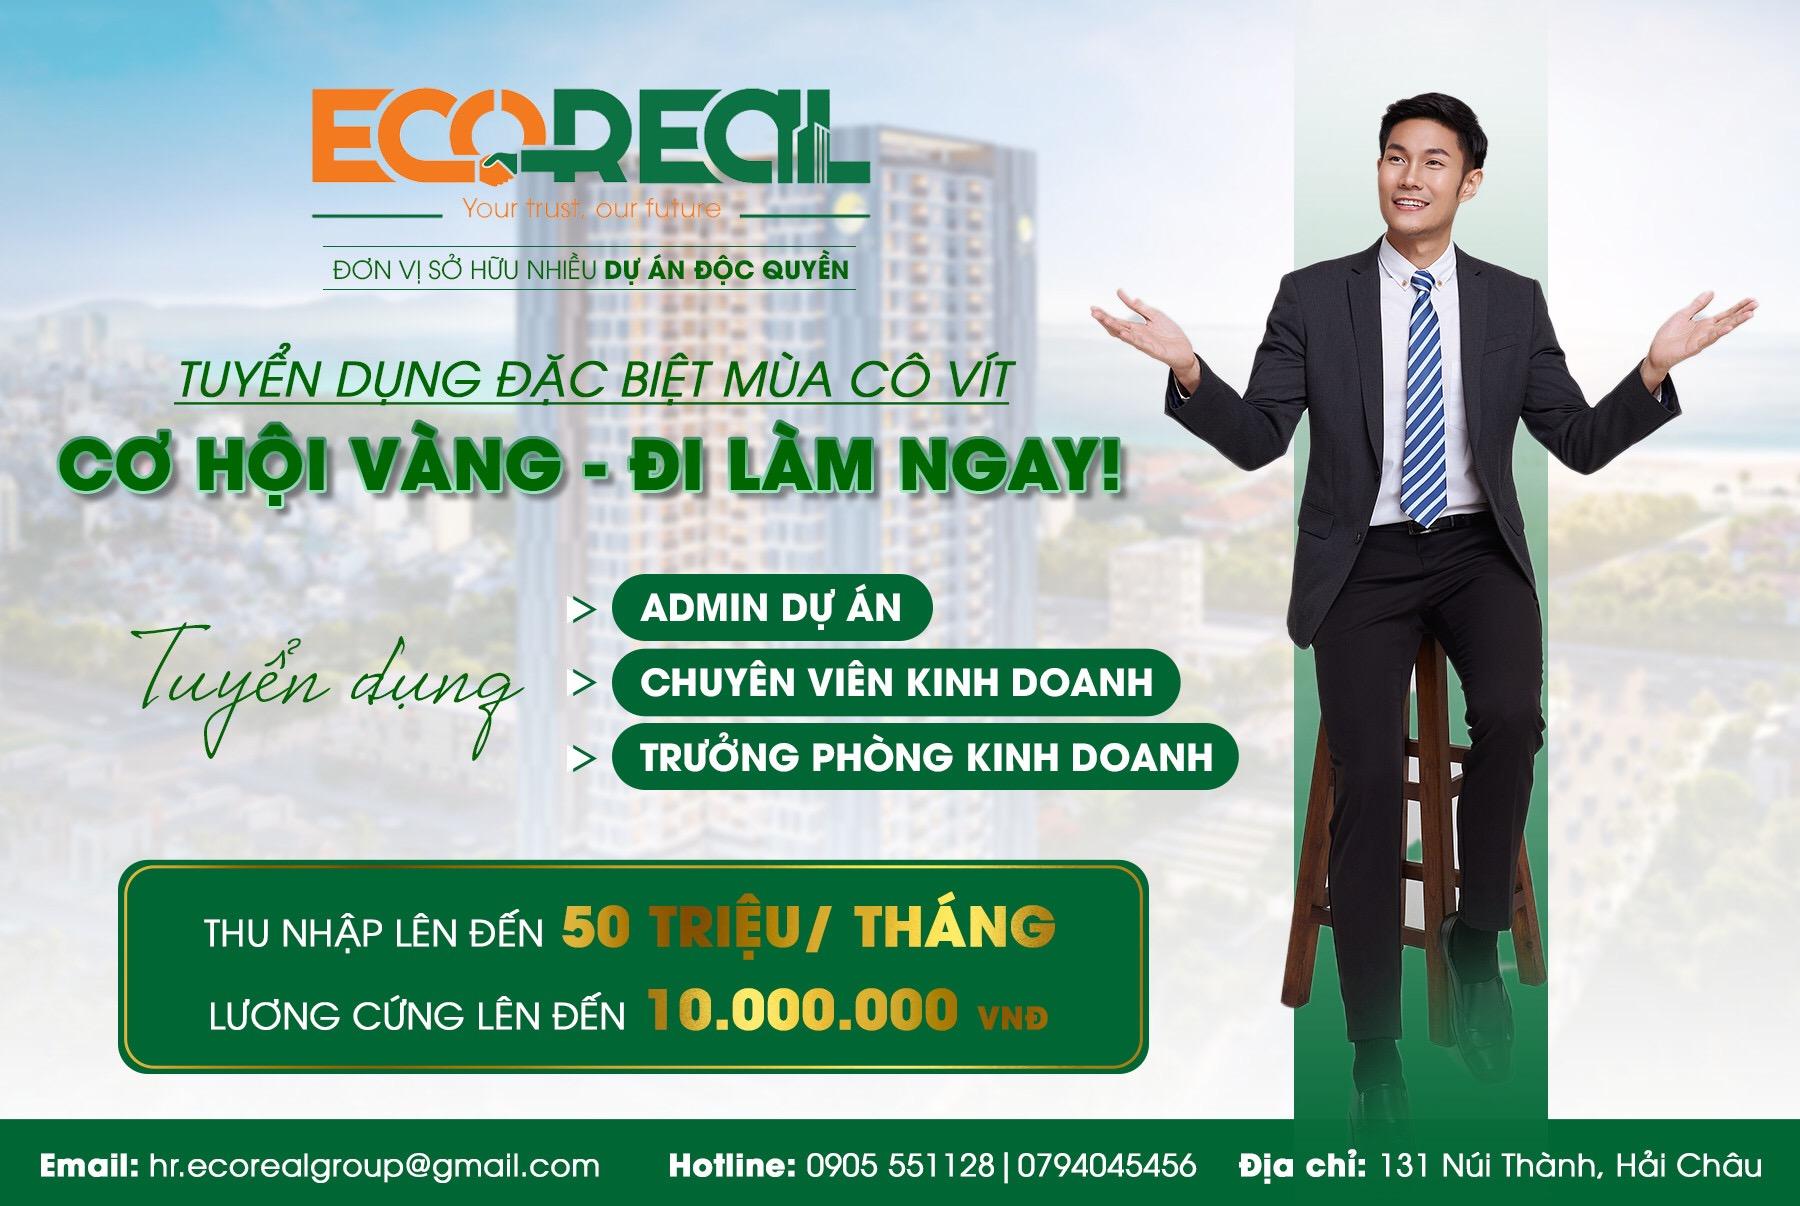 FCE1F07C-68BE-40F1-BCD1-936FCF9A8910